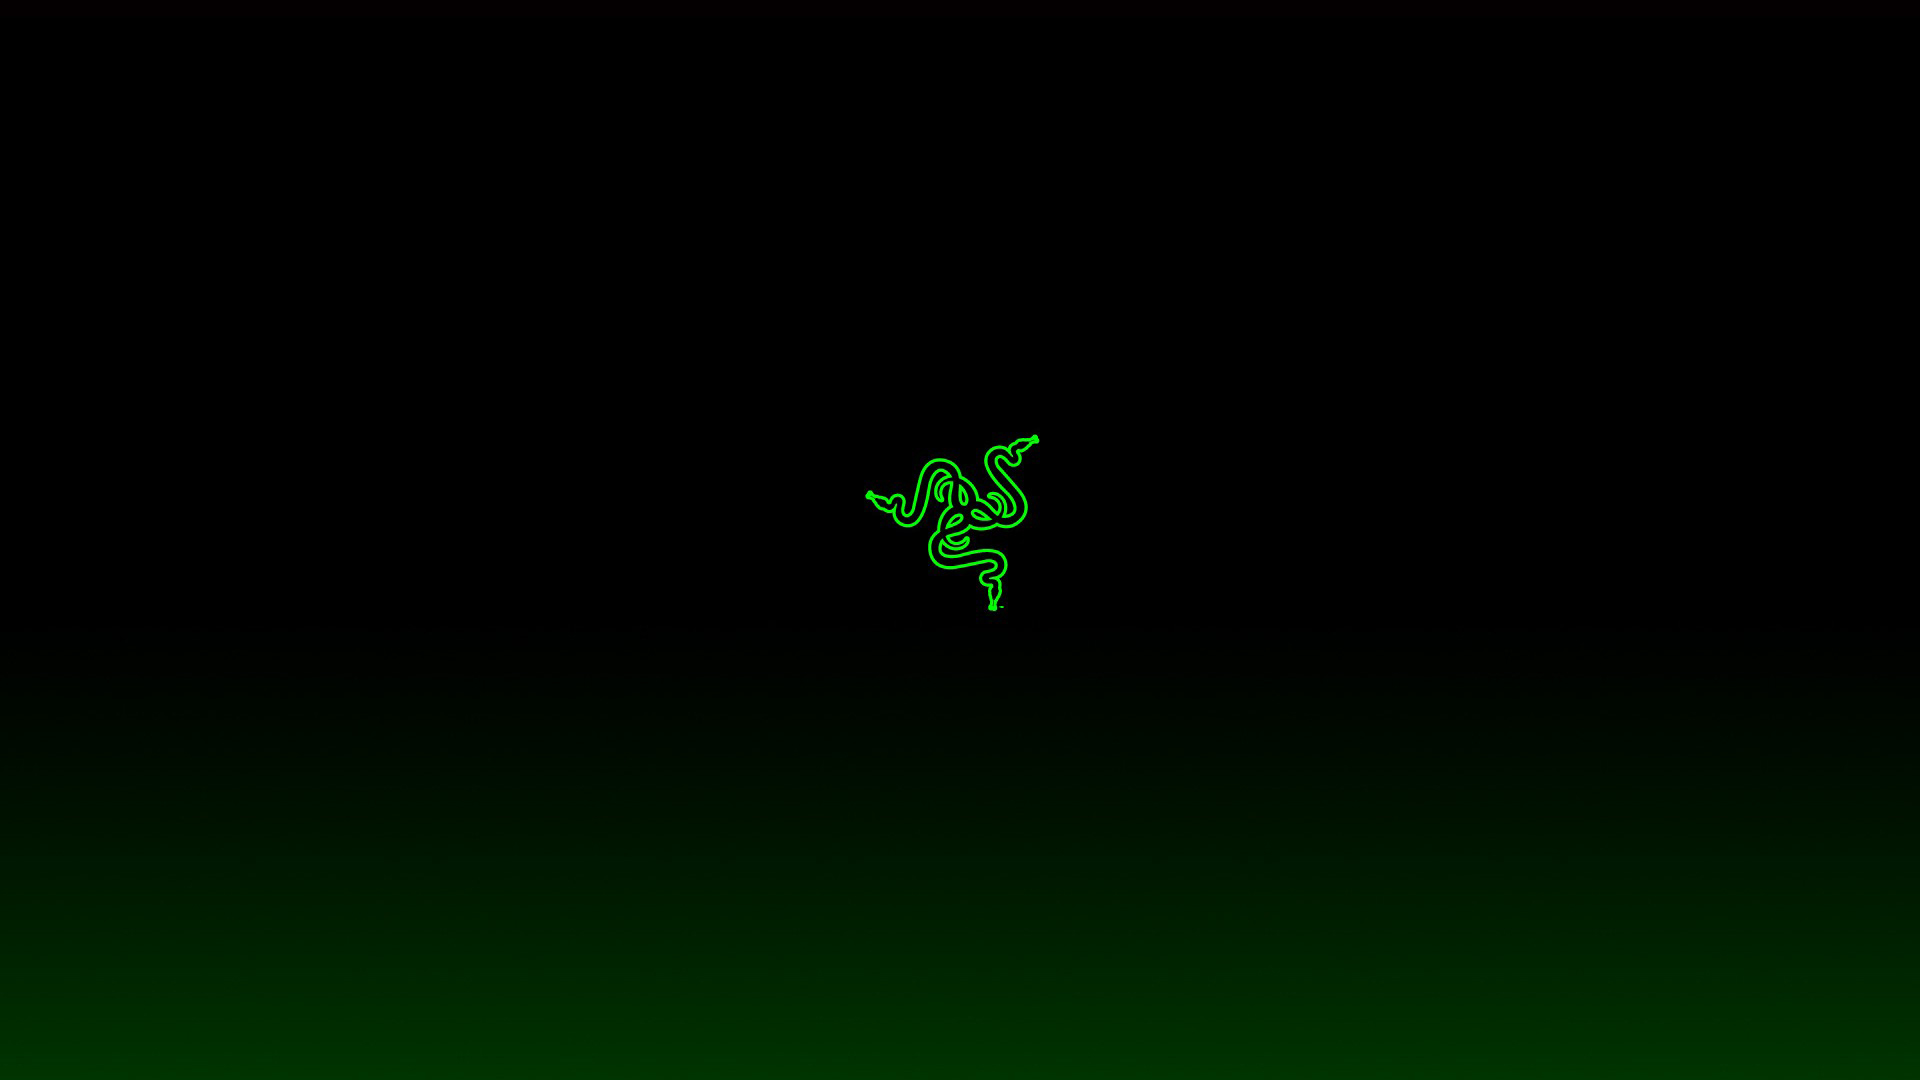 razer green logo hd wallpaper 1920x1080 1080p compatible for 1280x720 1920x1080